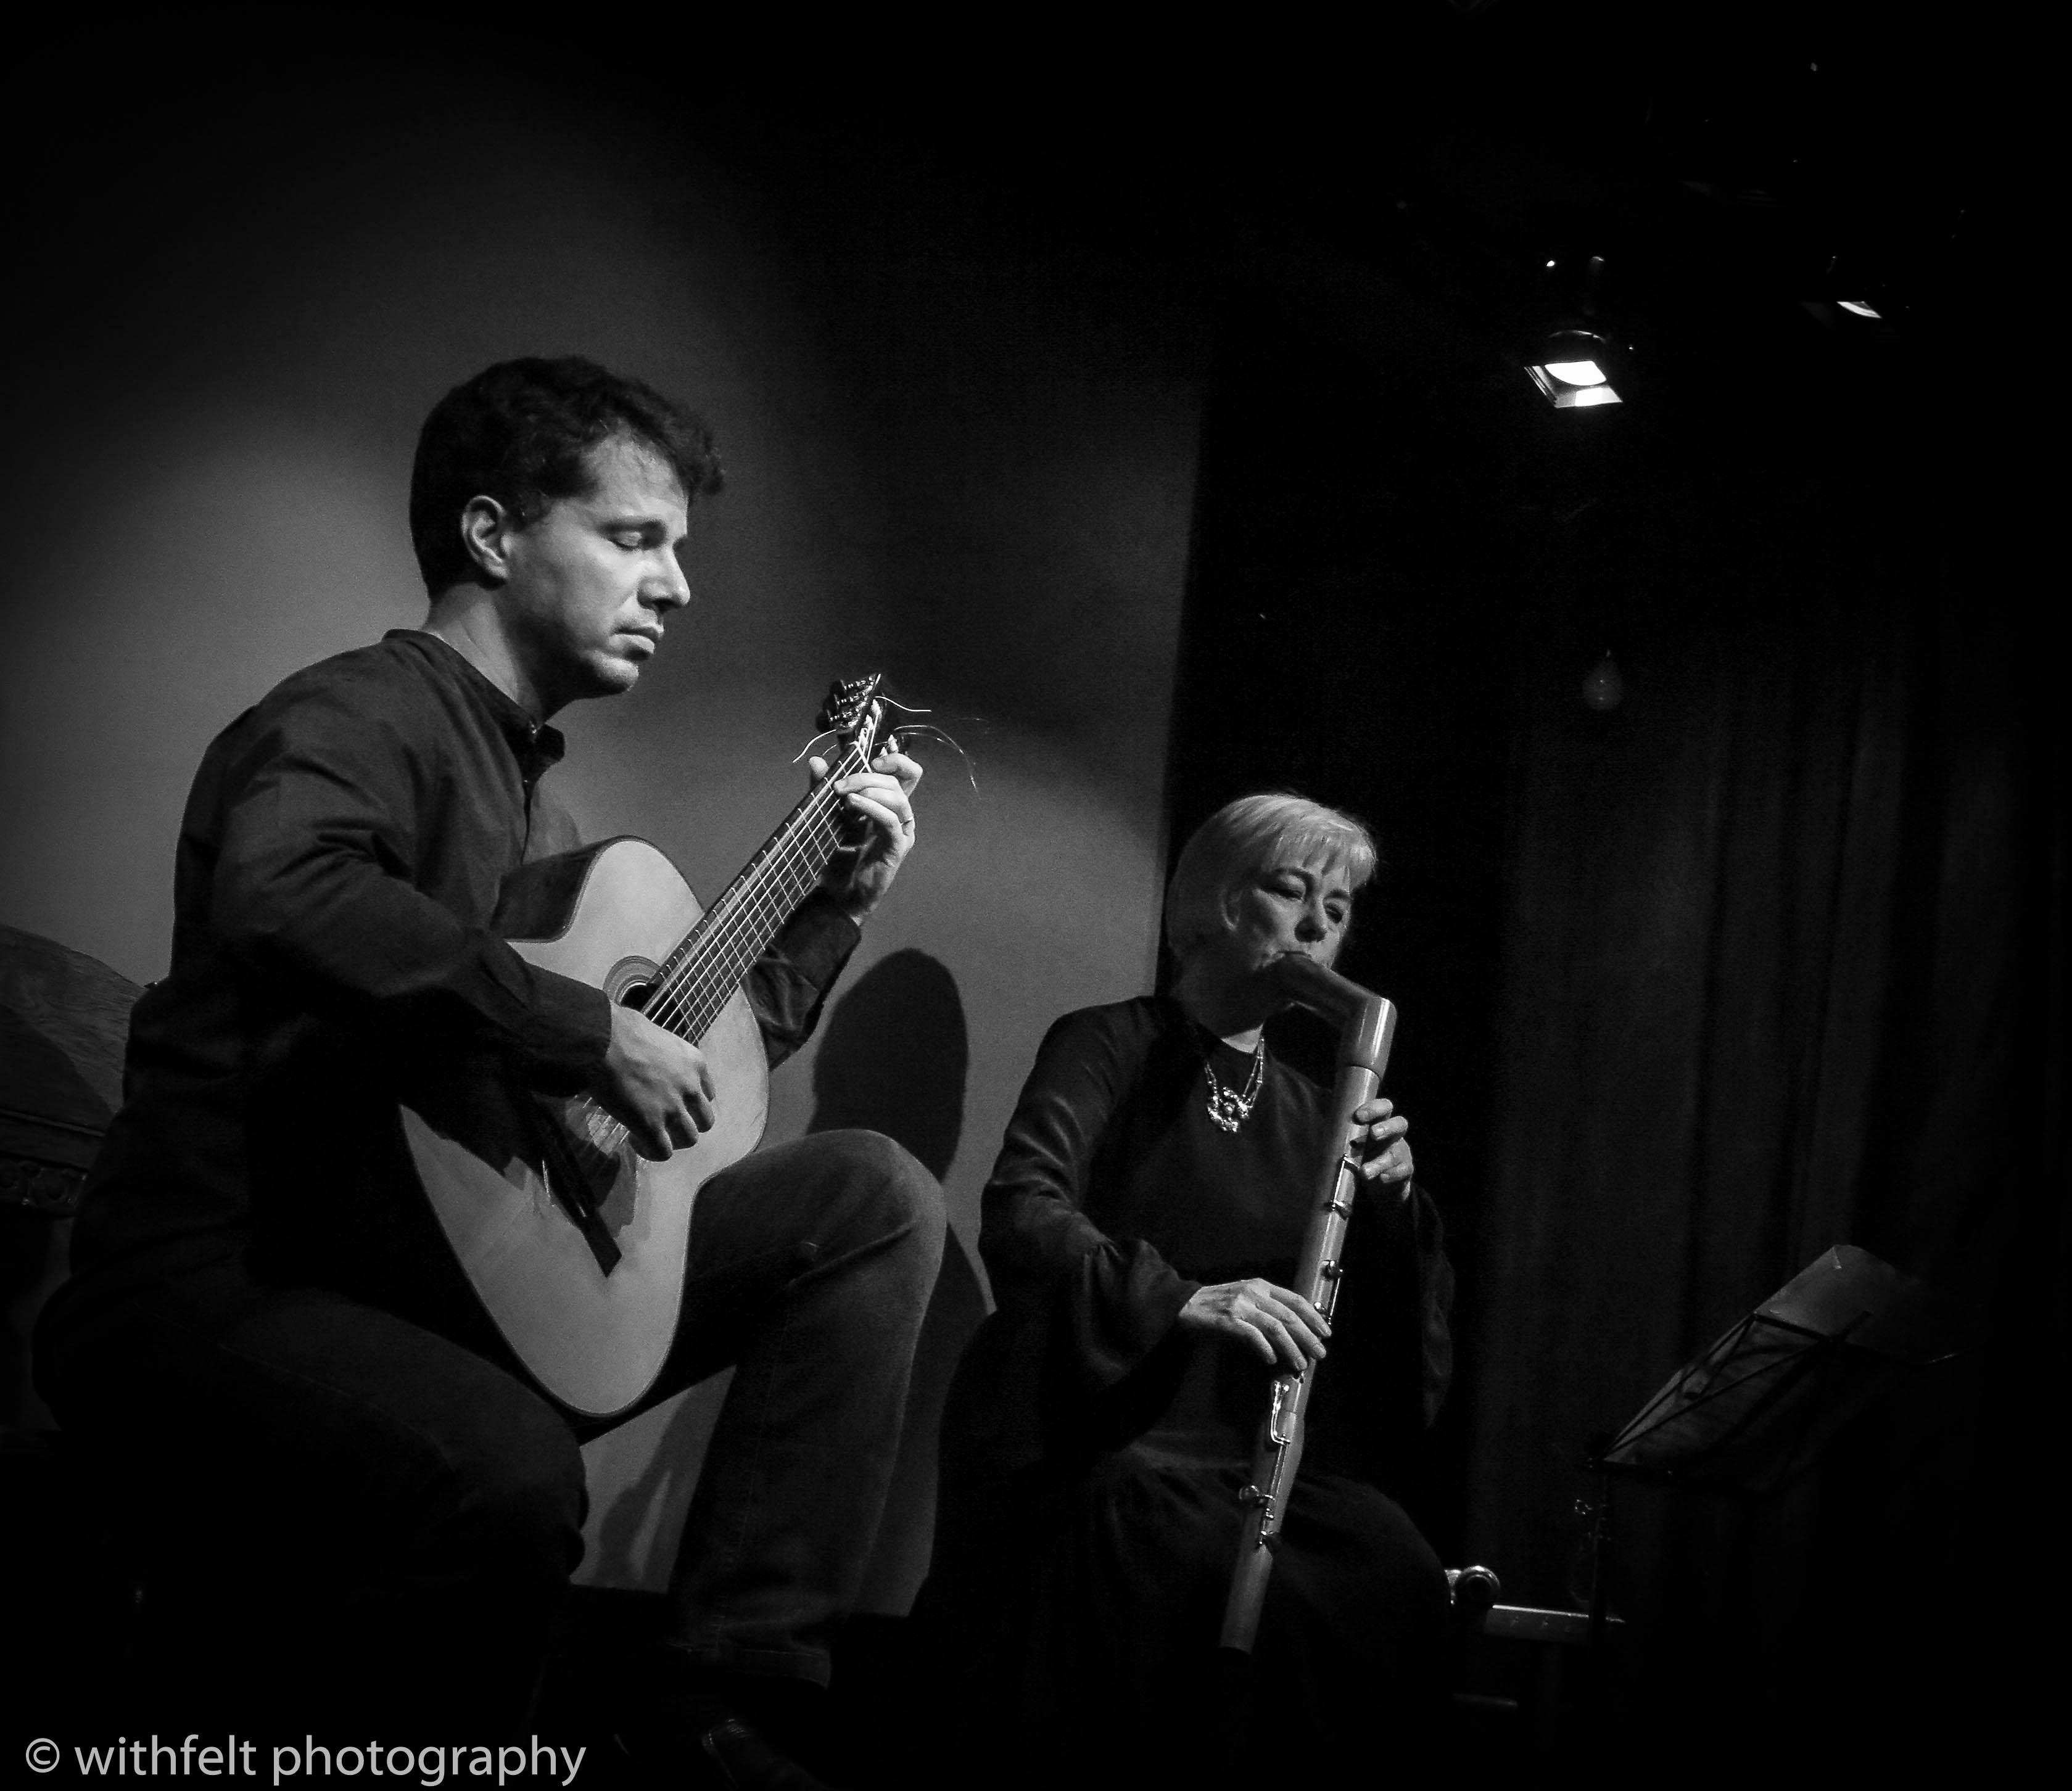 Daniel Murray & Michala Petri at concert in Posthus Teatret, Copenhagen 12.07.2019